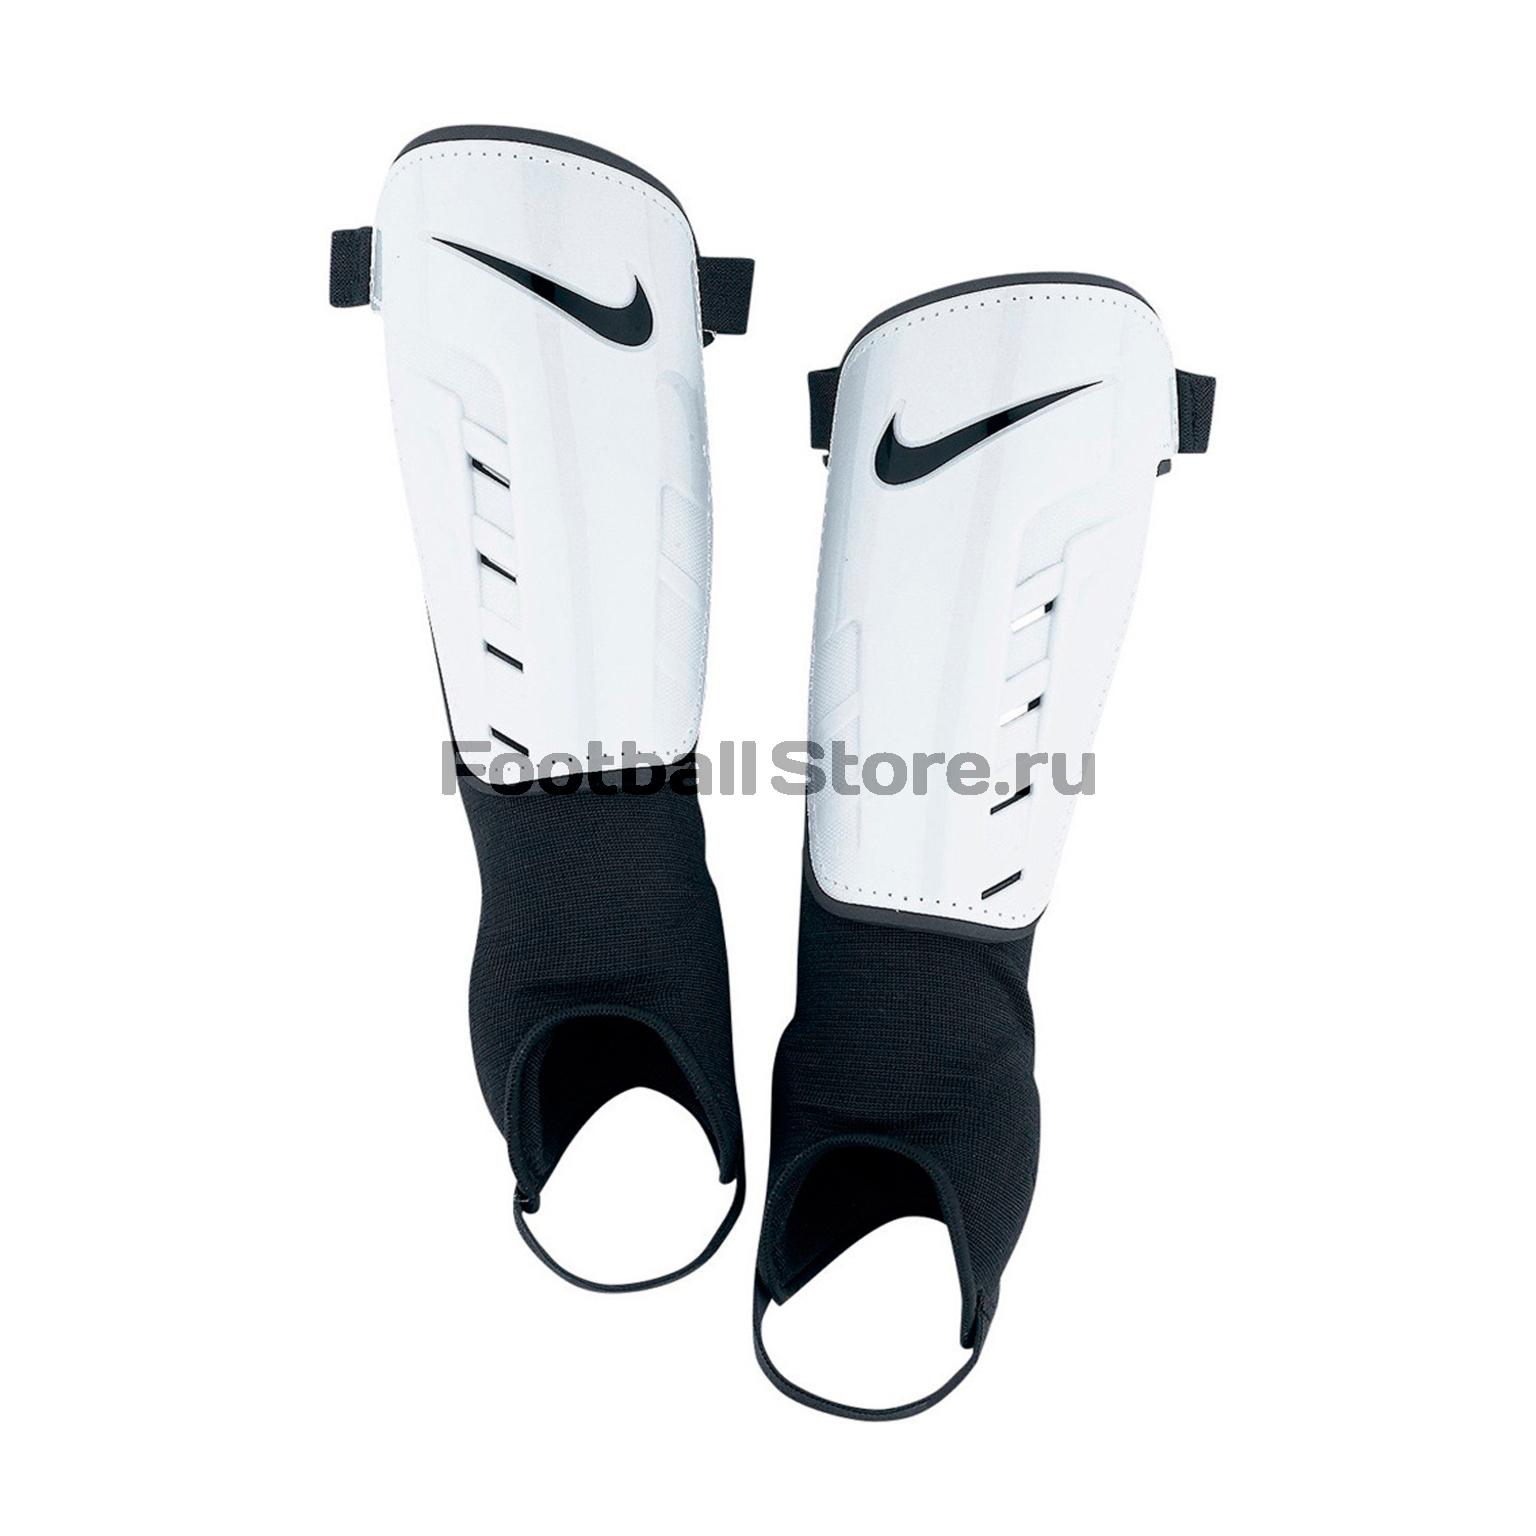 Защита ног Nike Щитки Nike Park shield